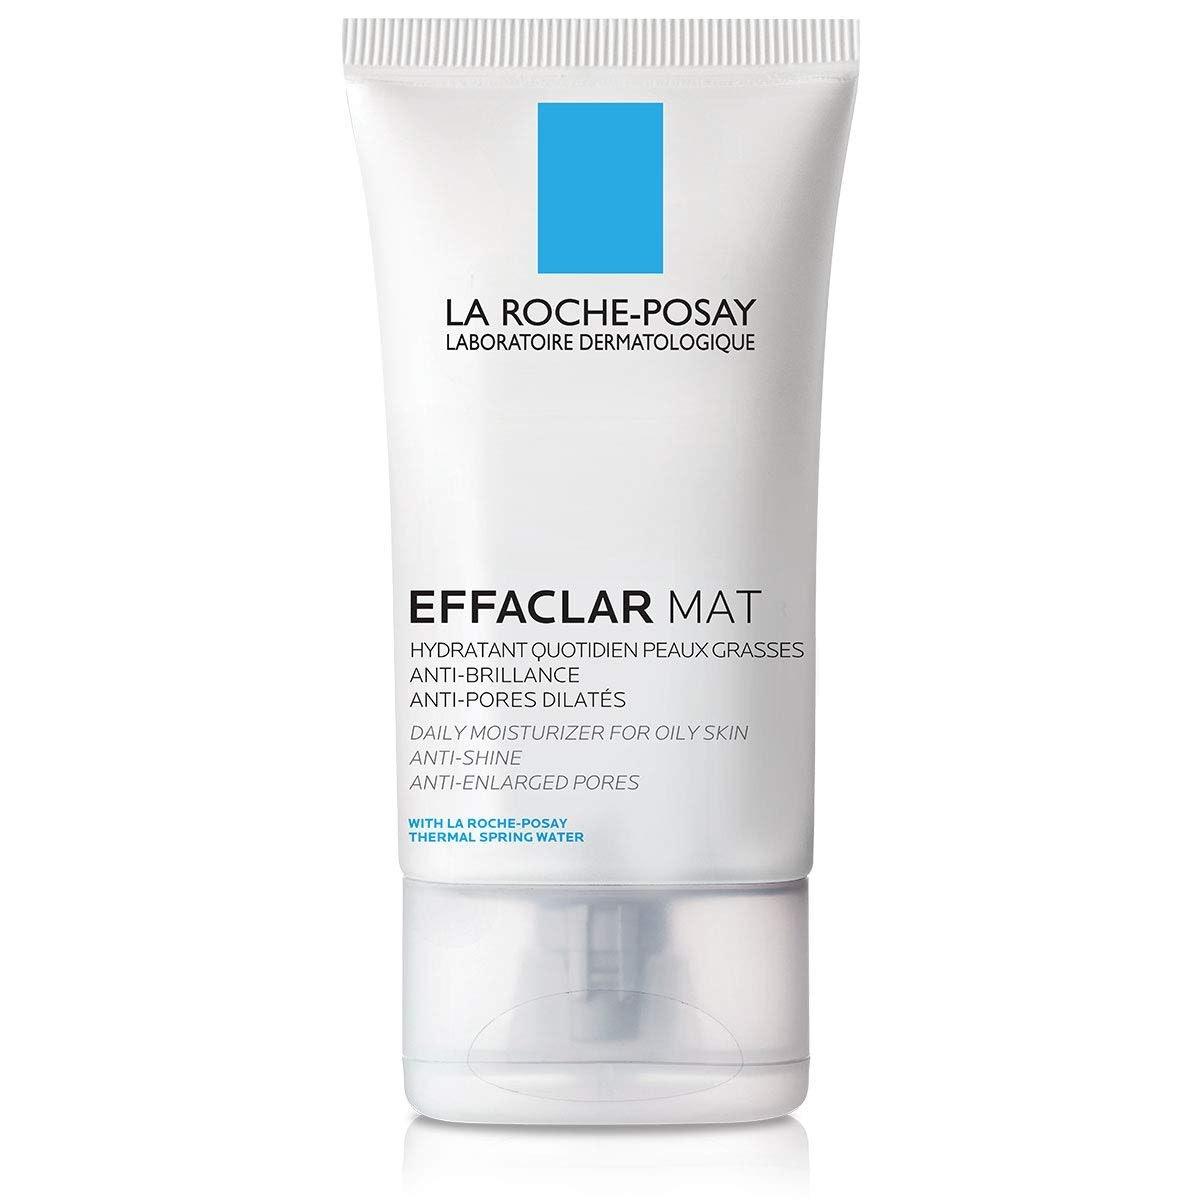 La Roche-Posay Effaclar Mat Mattifying Moisturizer